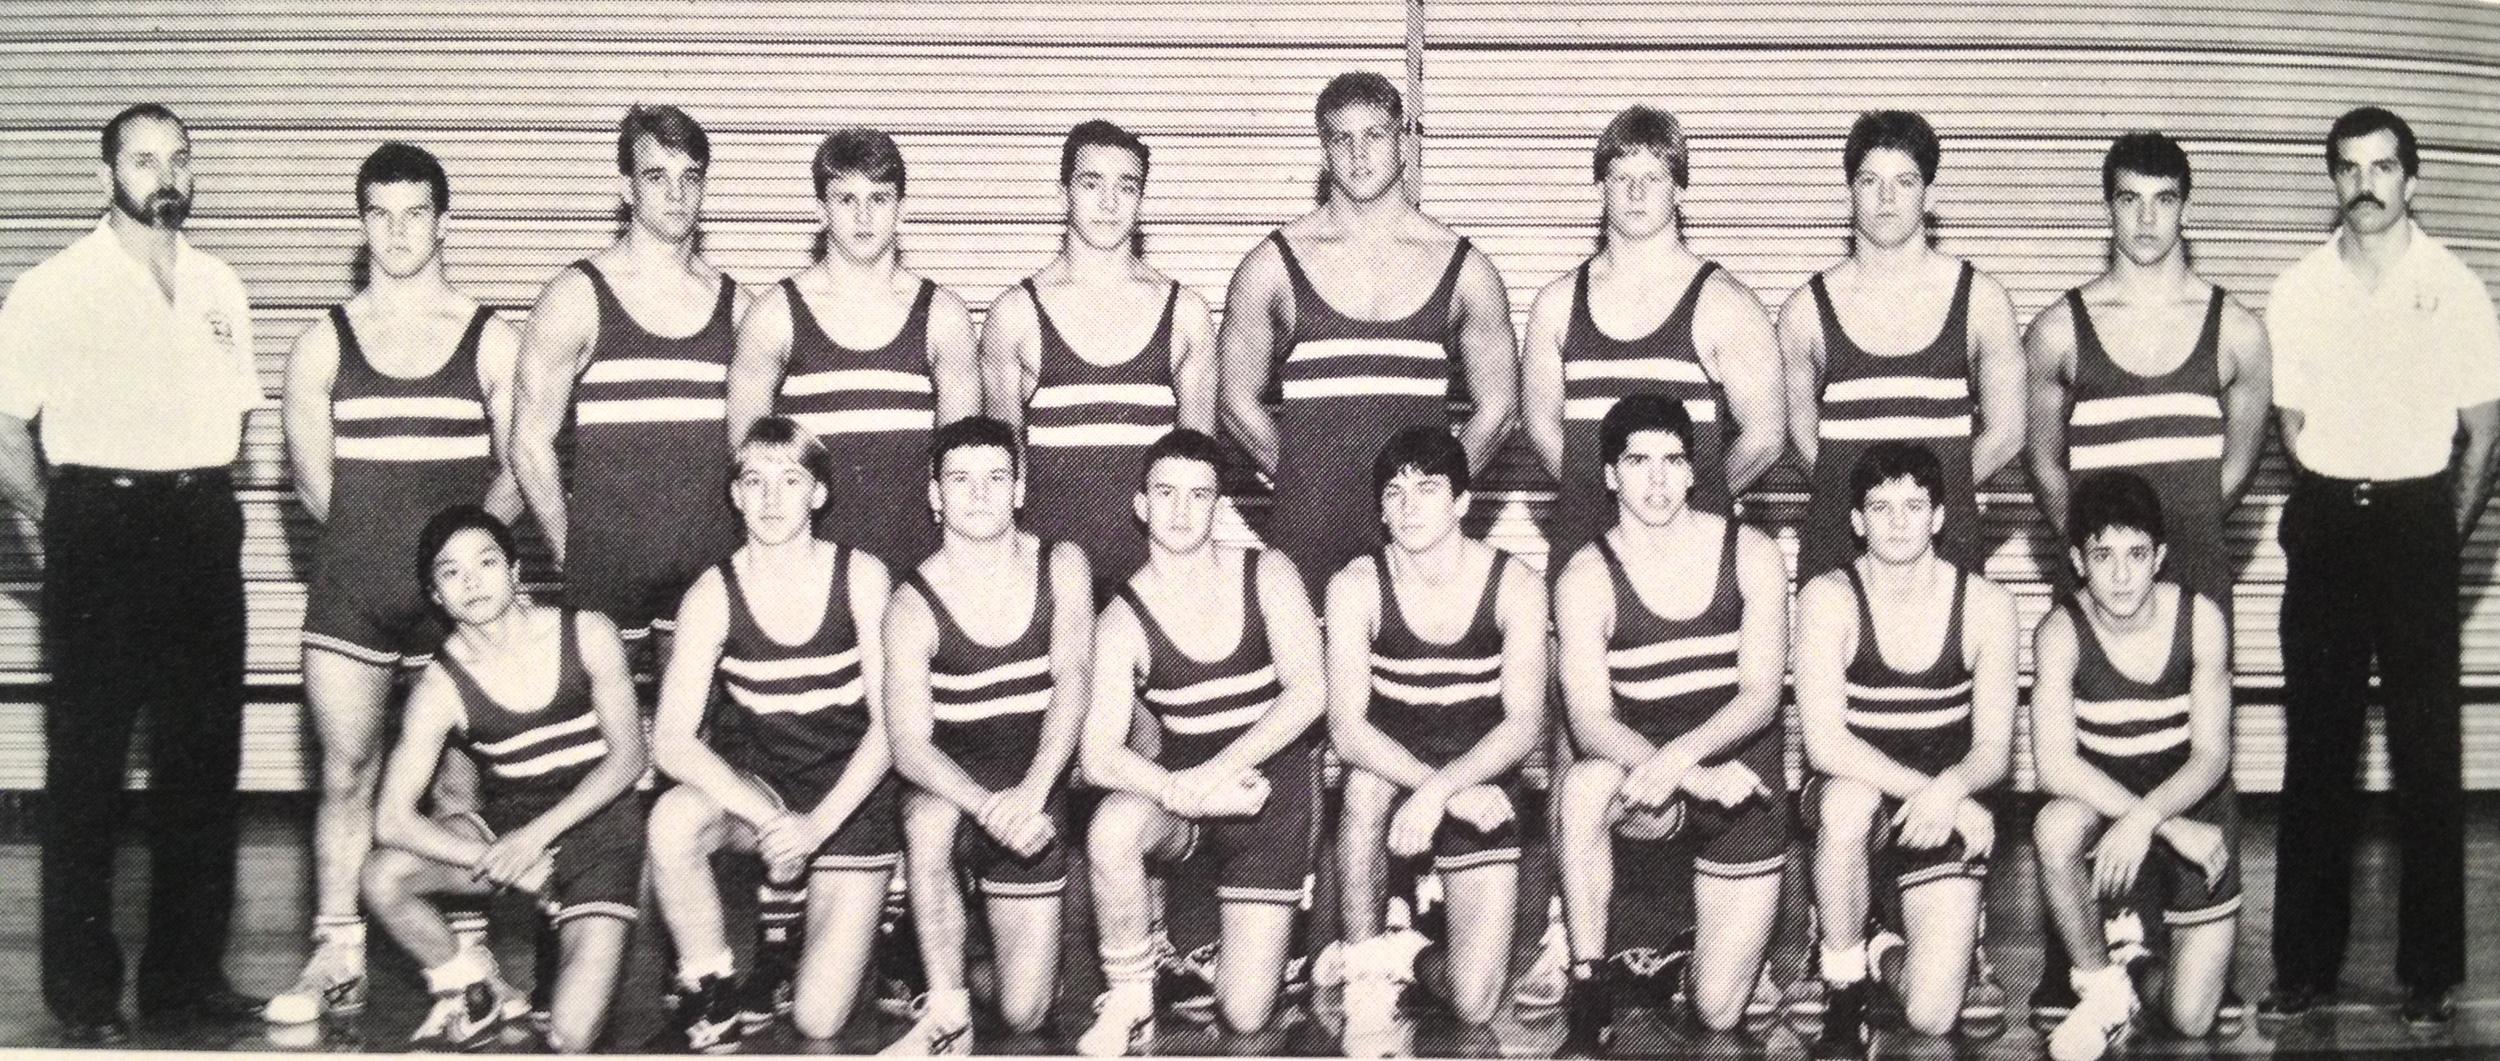 1988 District Champions